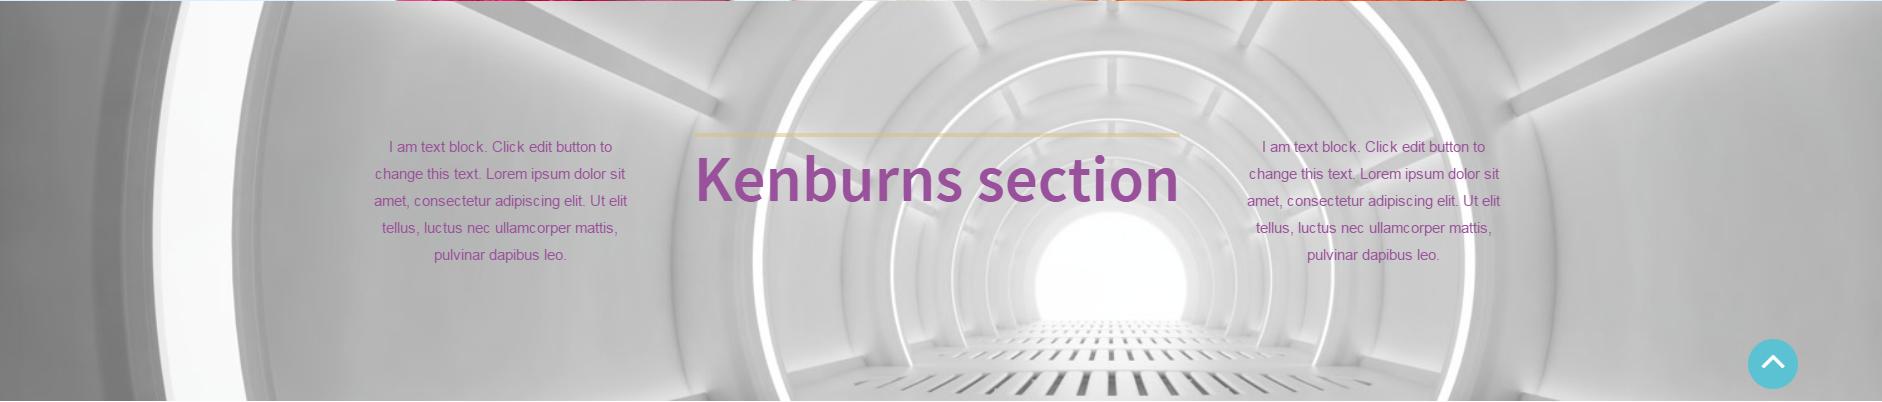 Kenburns section